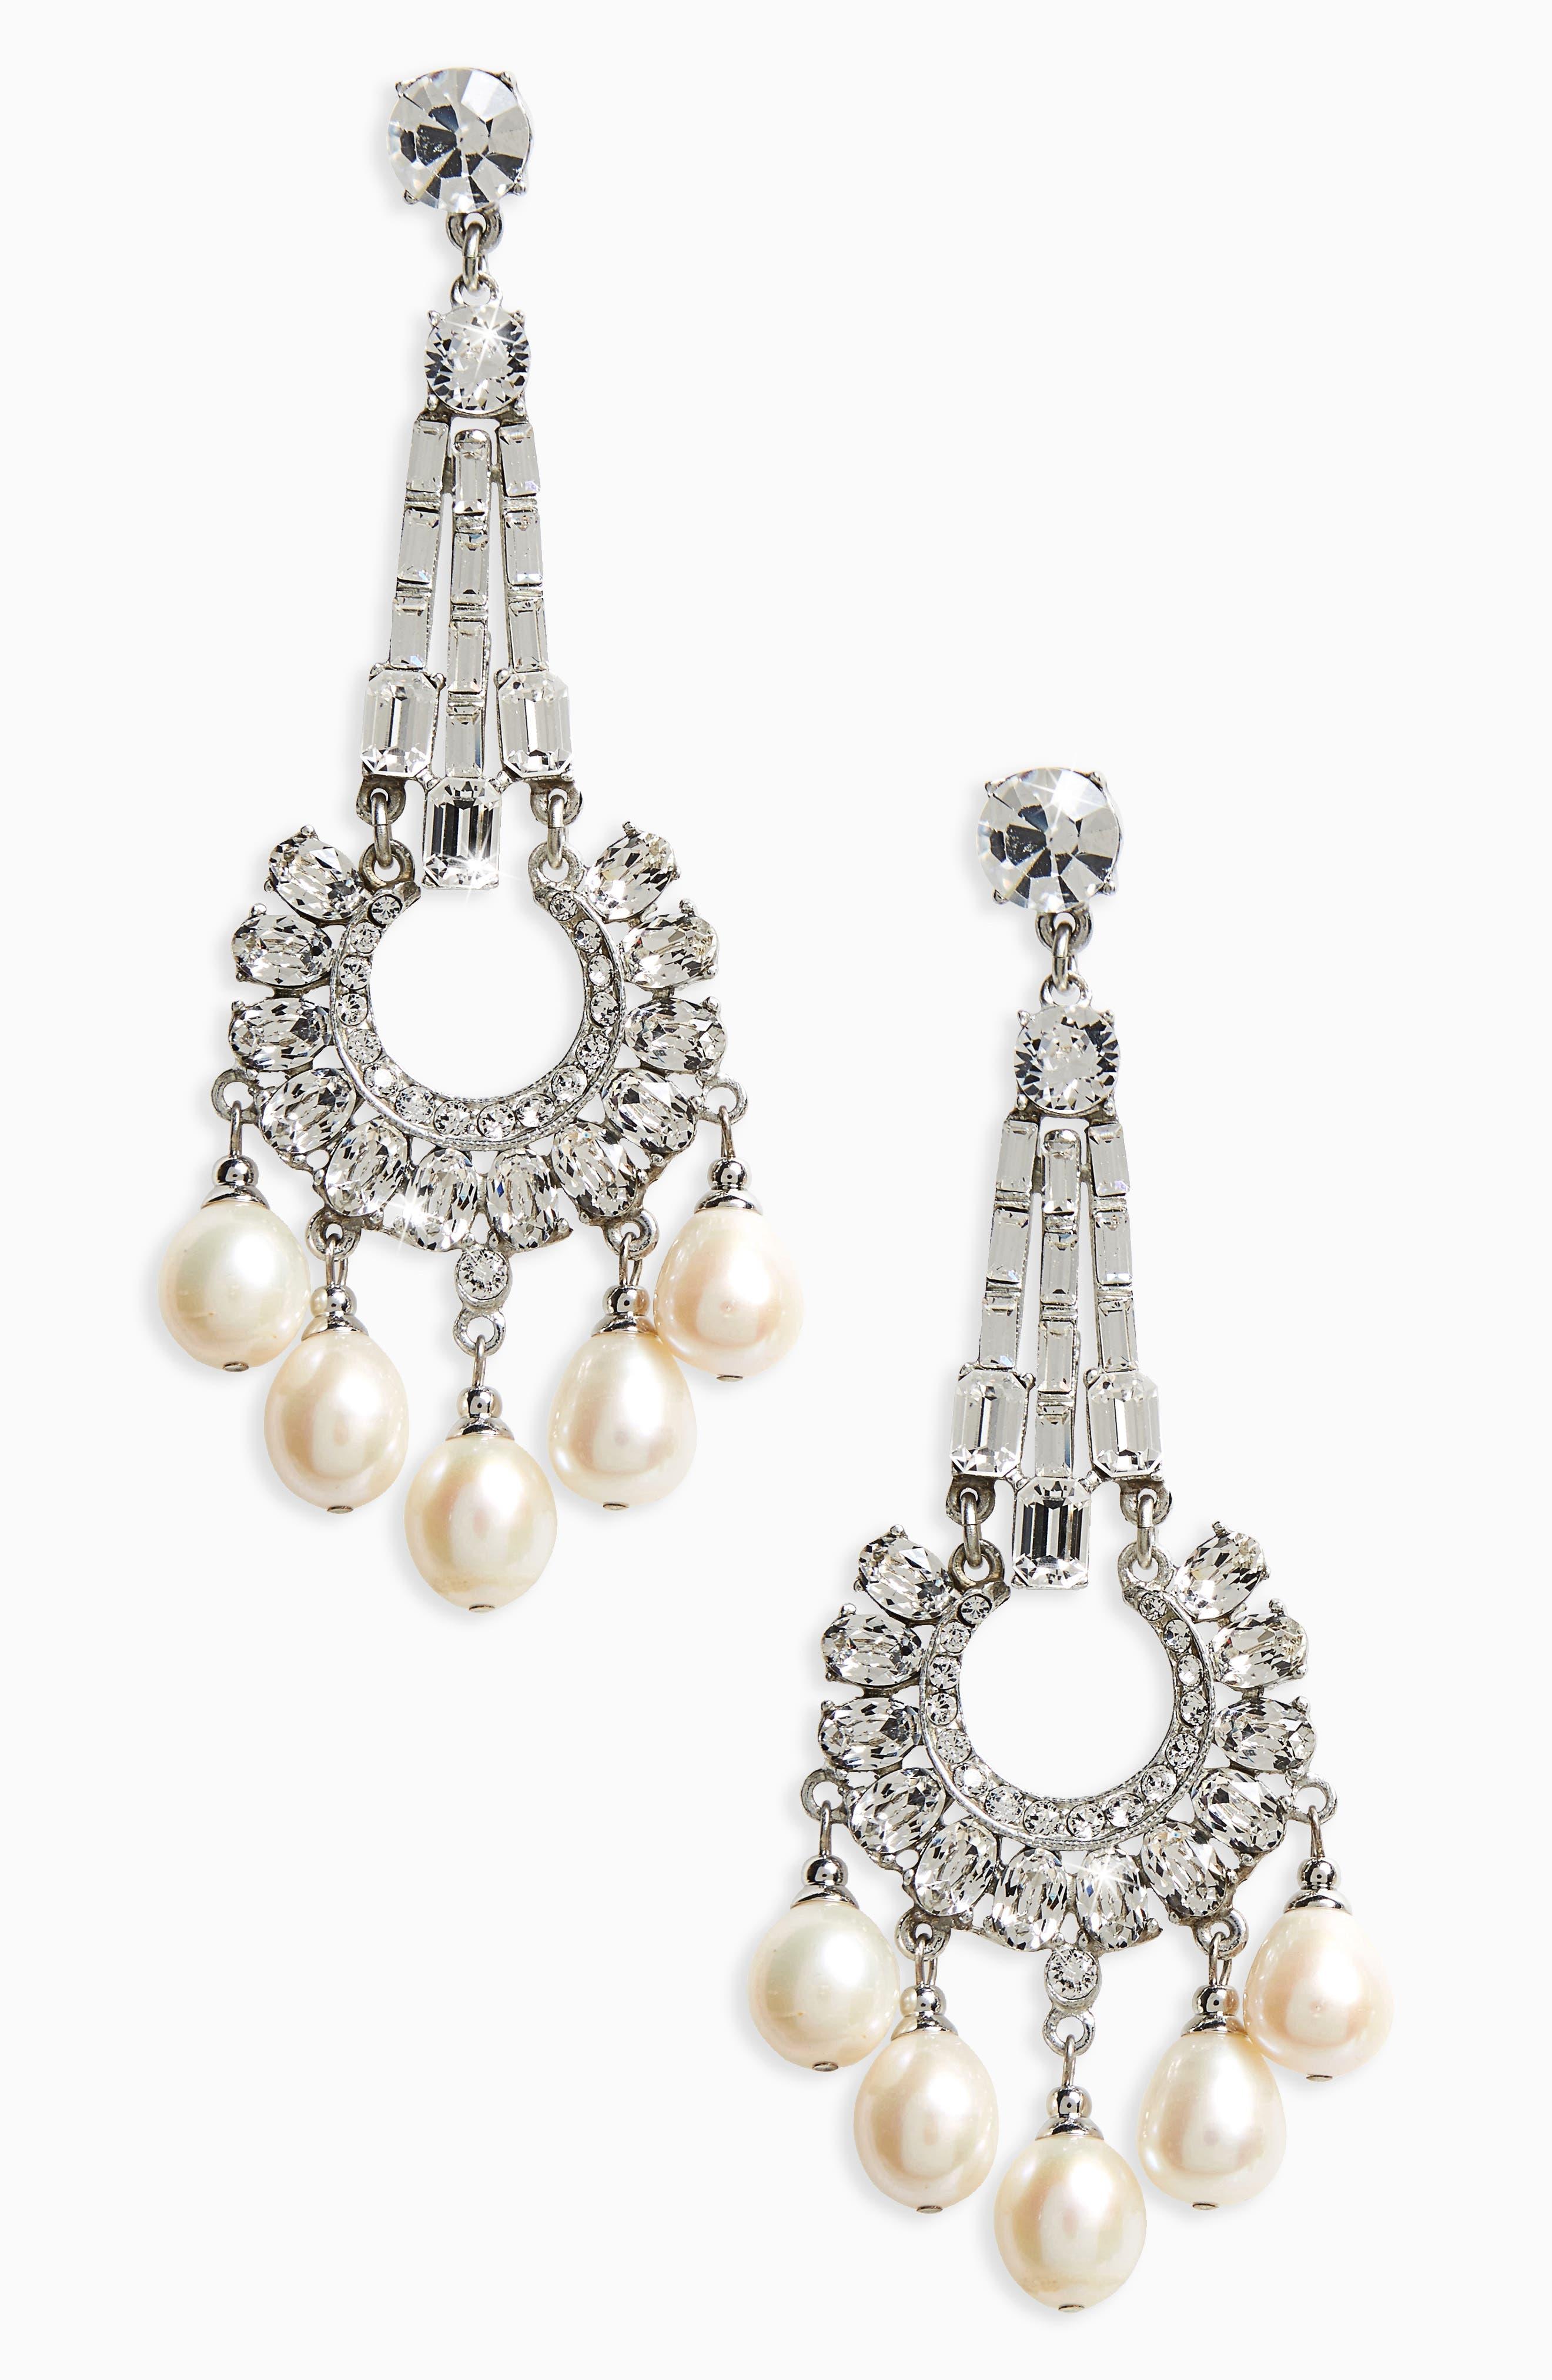 Main Image - Ben-Amun Imitation Pearl & Crystal Drop Earrings